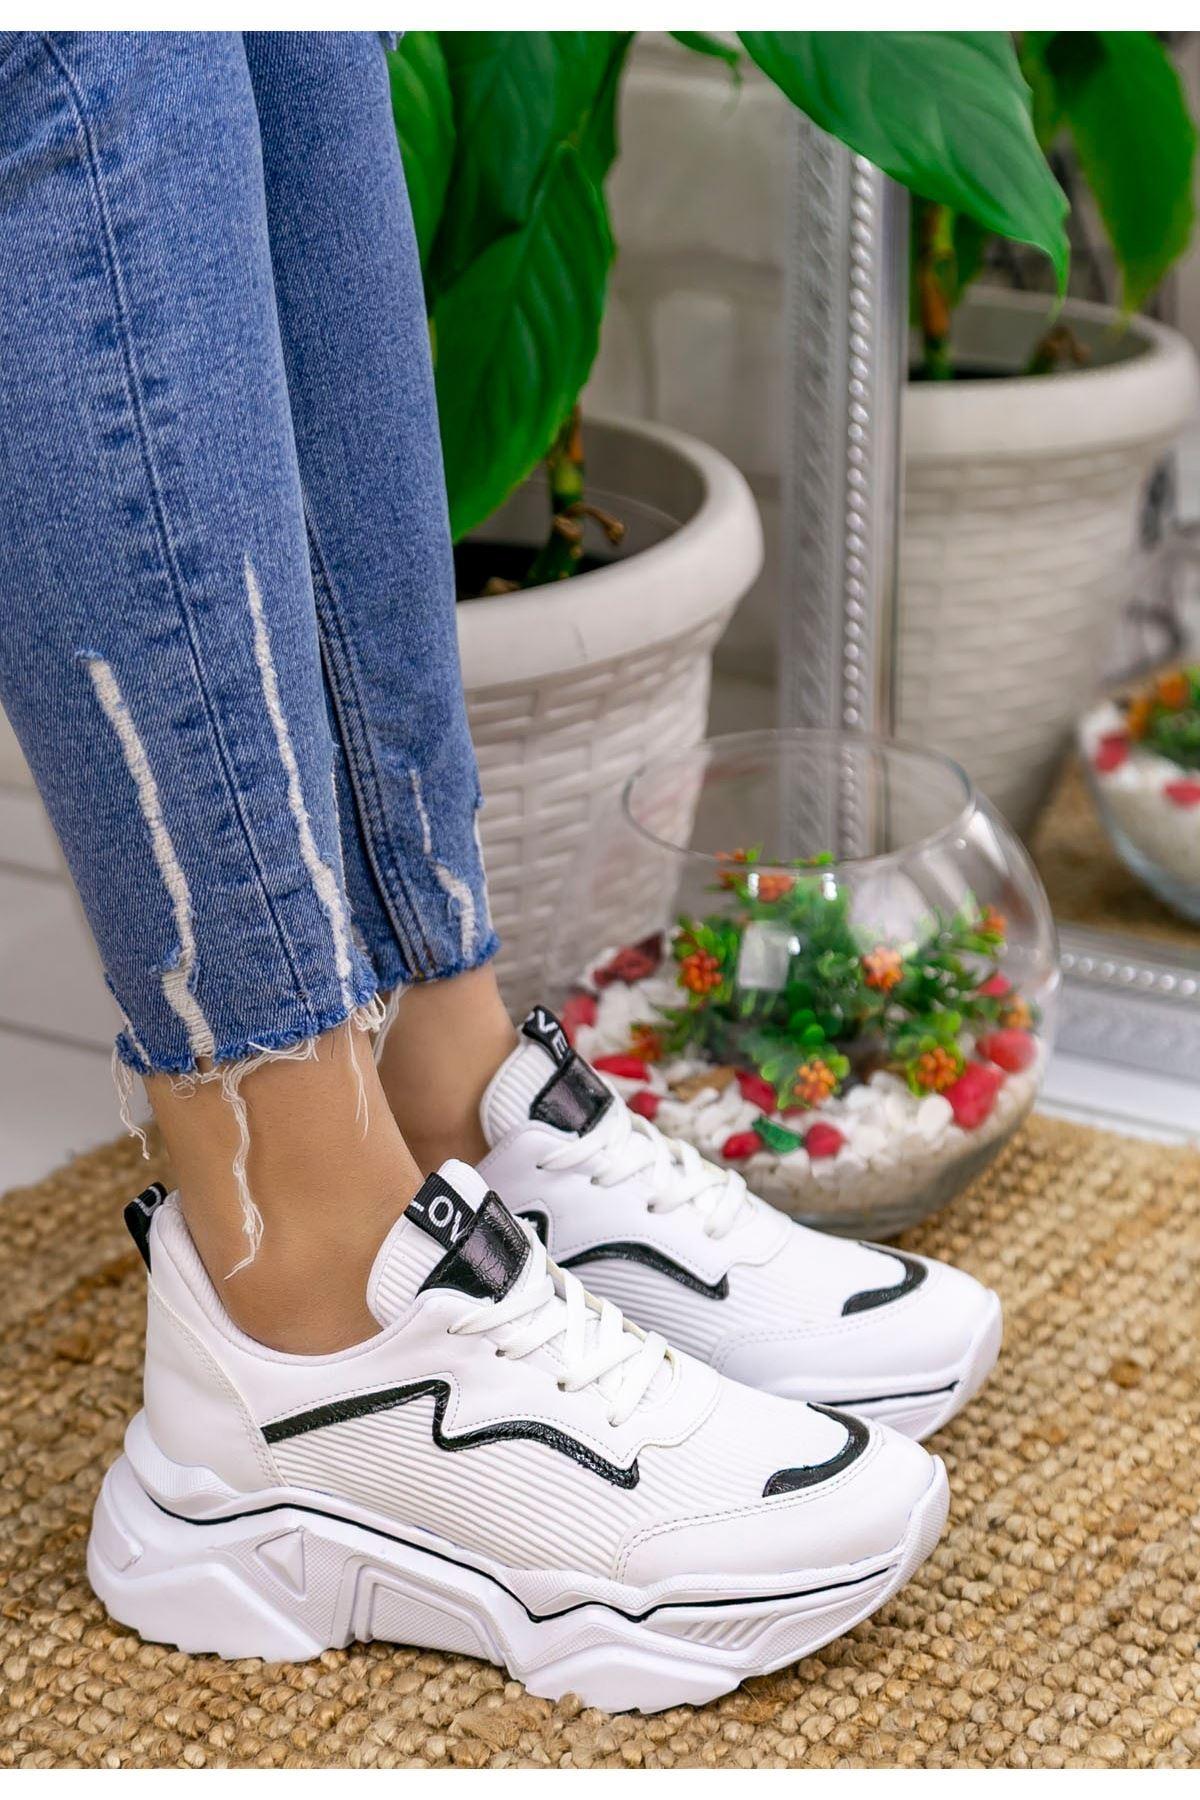 Vira Beyaz Cilt Siyah Cilt Detaylı Spor Ayakkabı